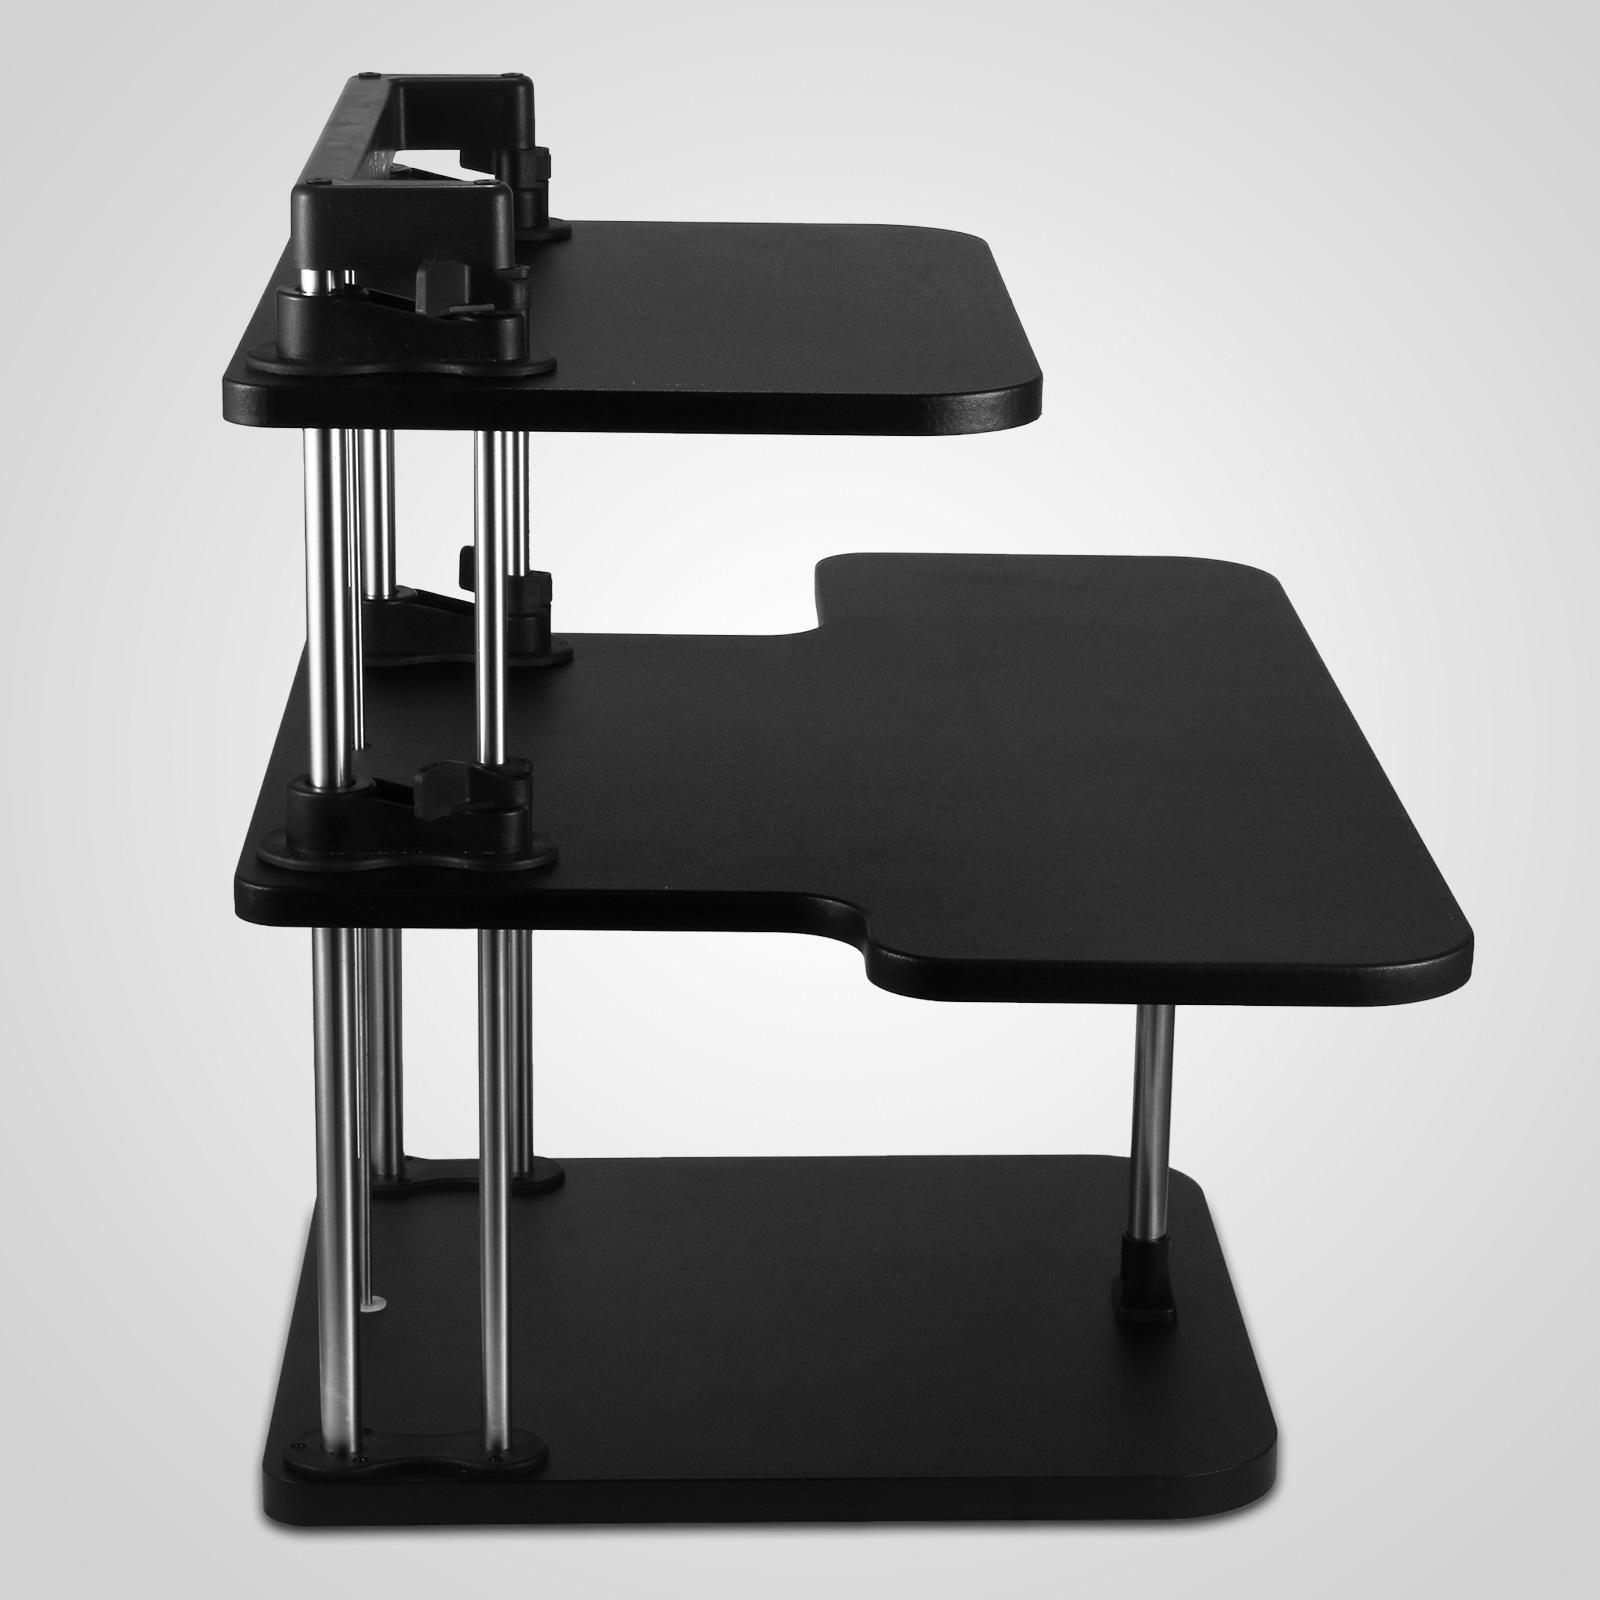 Ergonomic Height Adjustable Standing Desk Computer Sit Stand Up Desk 3 Layers